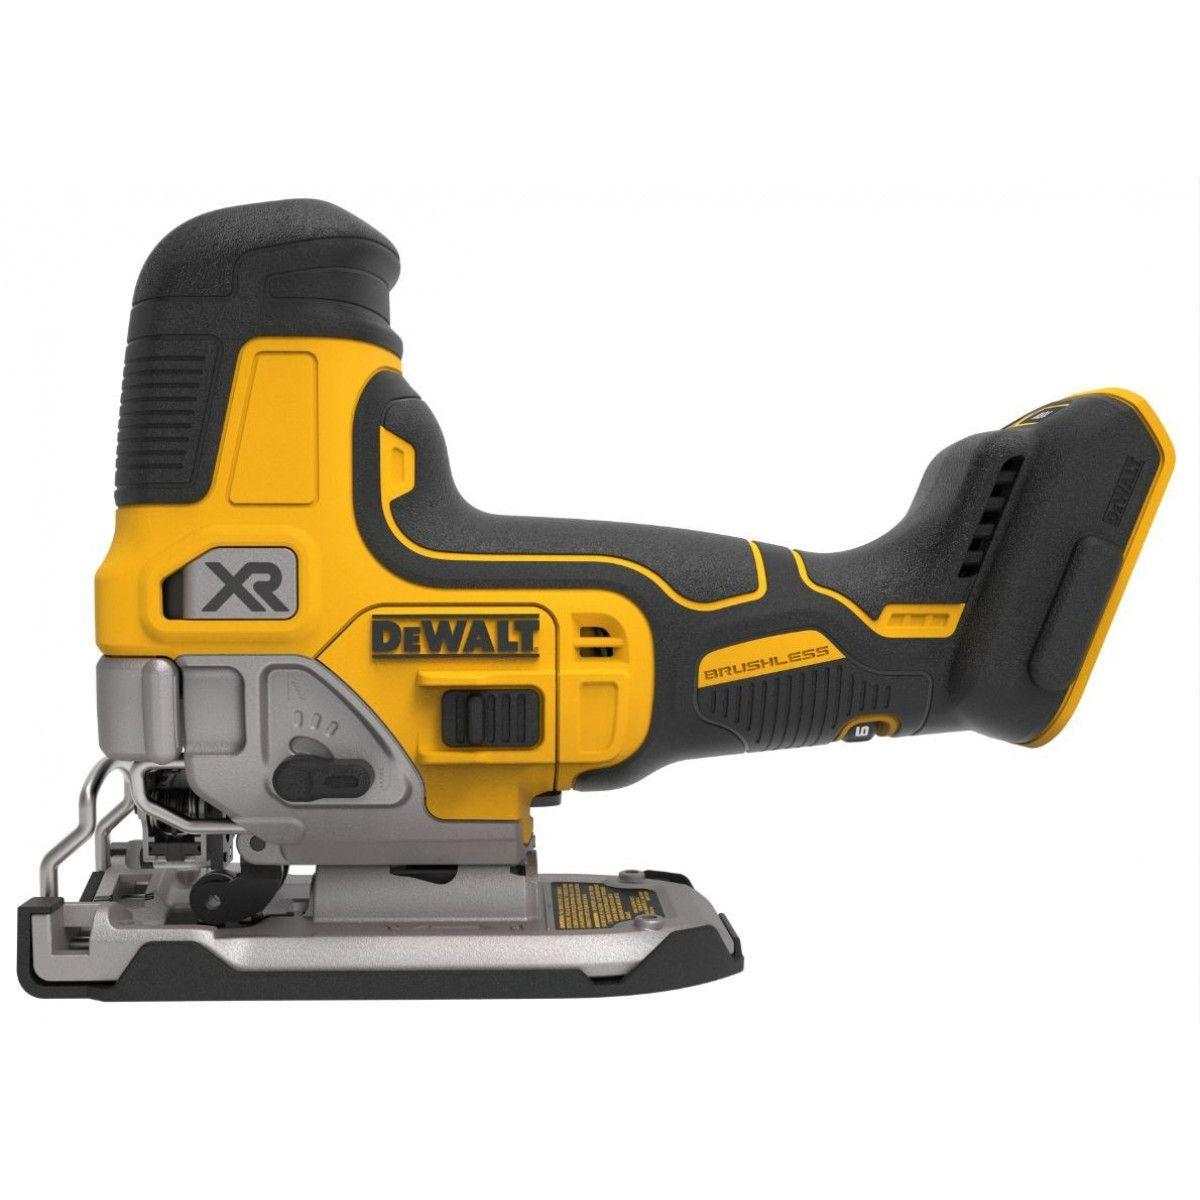 Dewalt Dcs335b 20v Max Xr Brushless Cordless Barrel Grip Jigsaw Tool Only Jig Saws Dewalt Tools Dewalt Power Tools